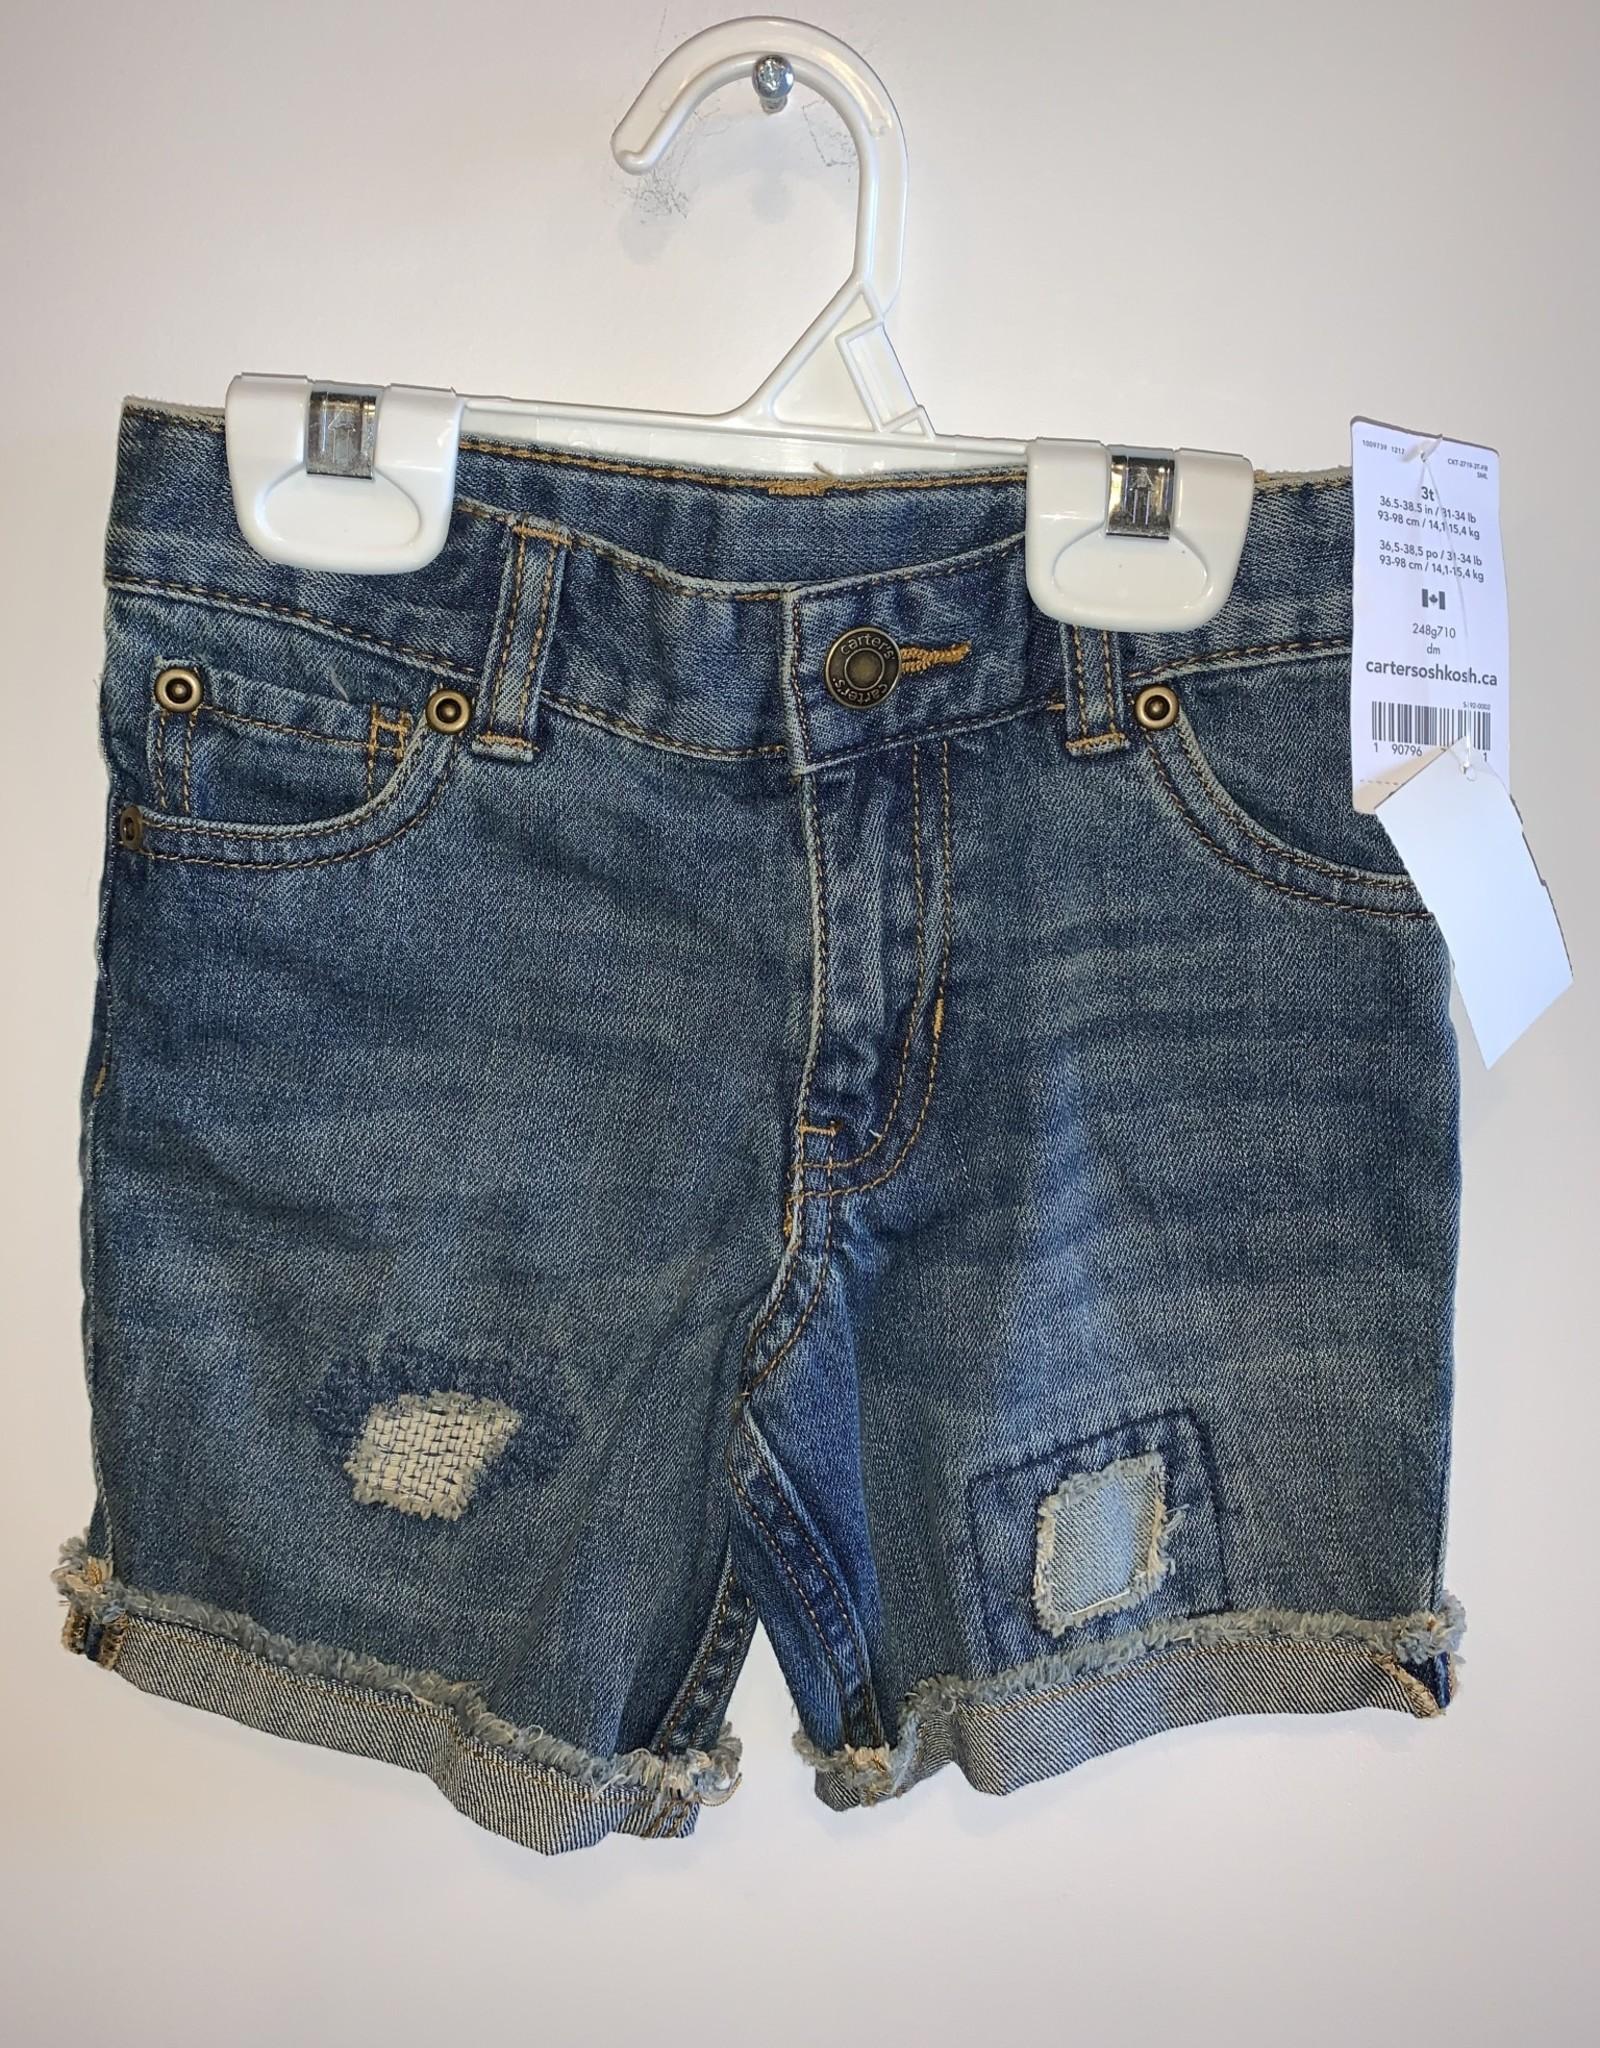 Carter's Boys/3T/Carters/Shorts